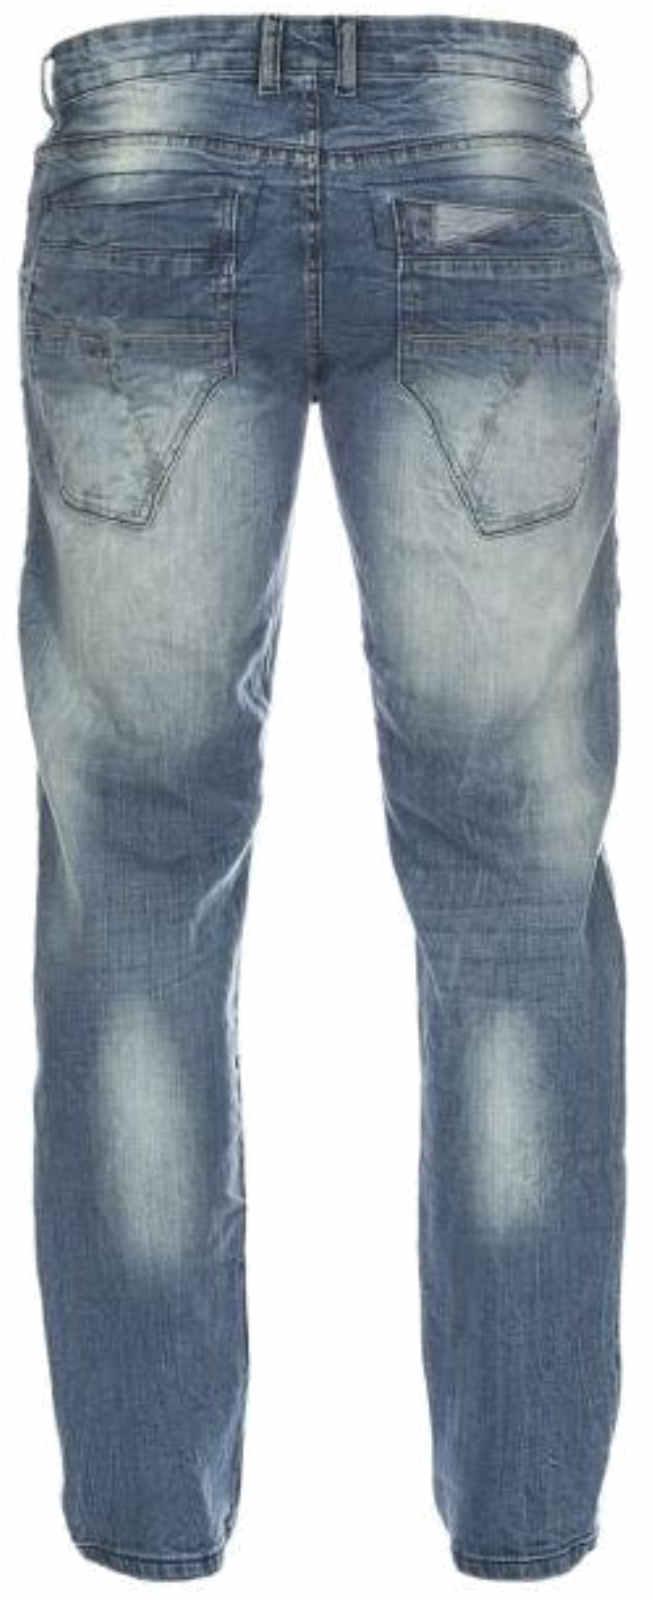 m o d herren jeans jason regular sp16 1028 low waist neu. Black Bedroom Furniture Sets. Home Design Ideas